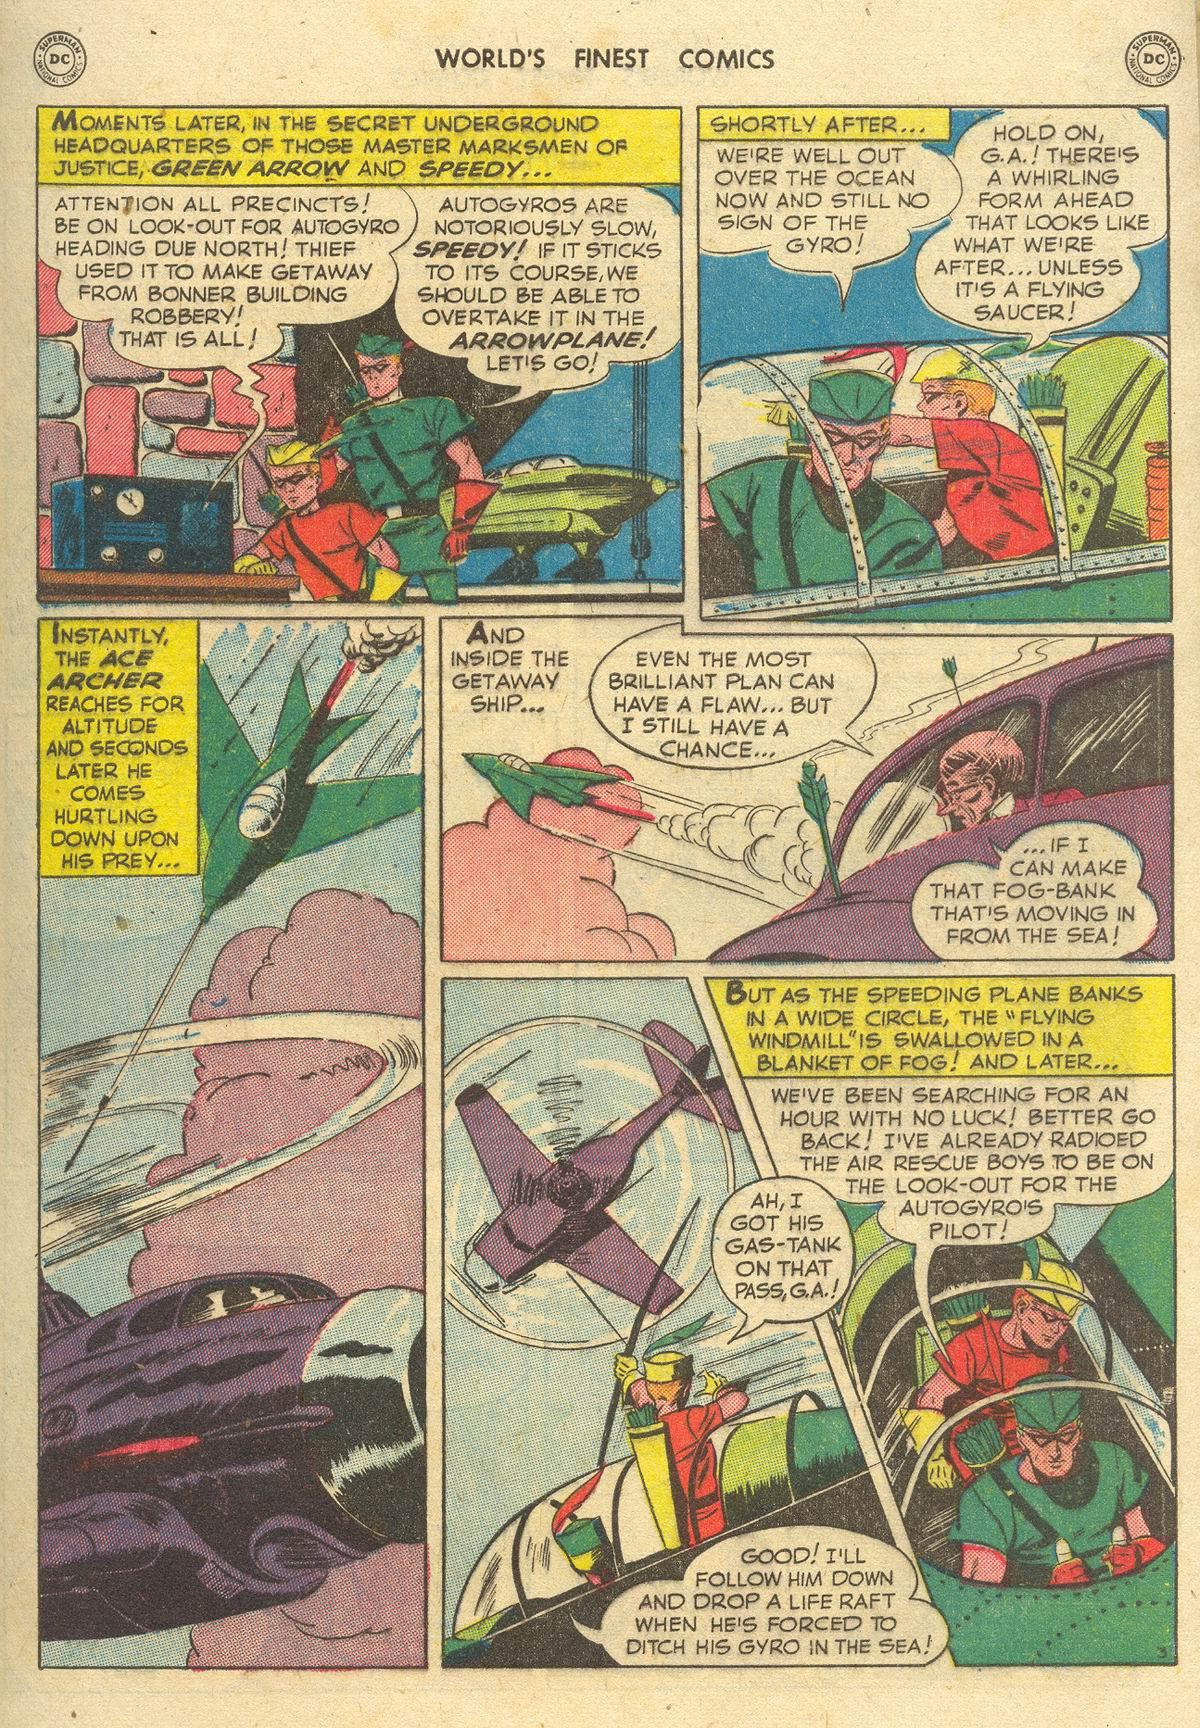 Read online World's Finest Comics comic -  Issue #51 - 19